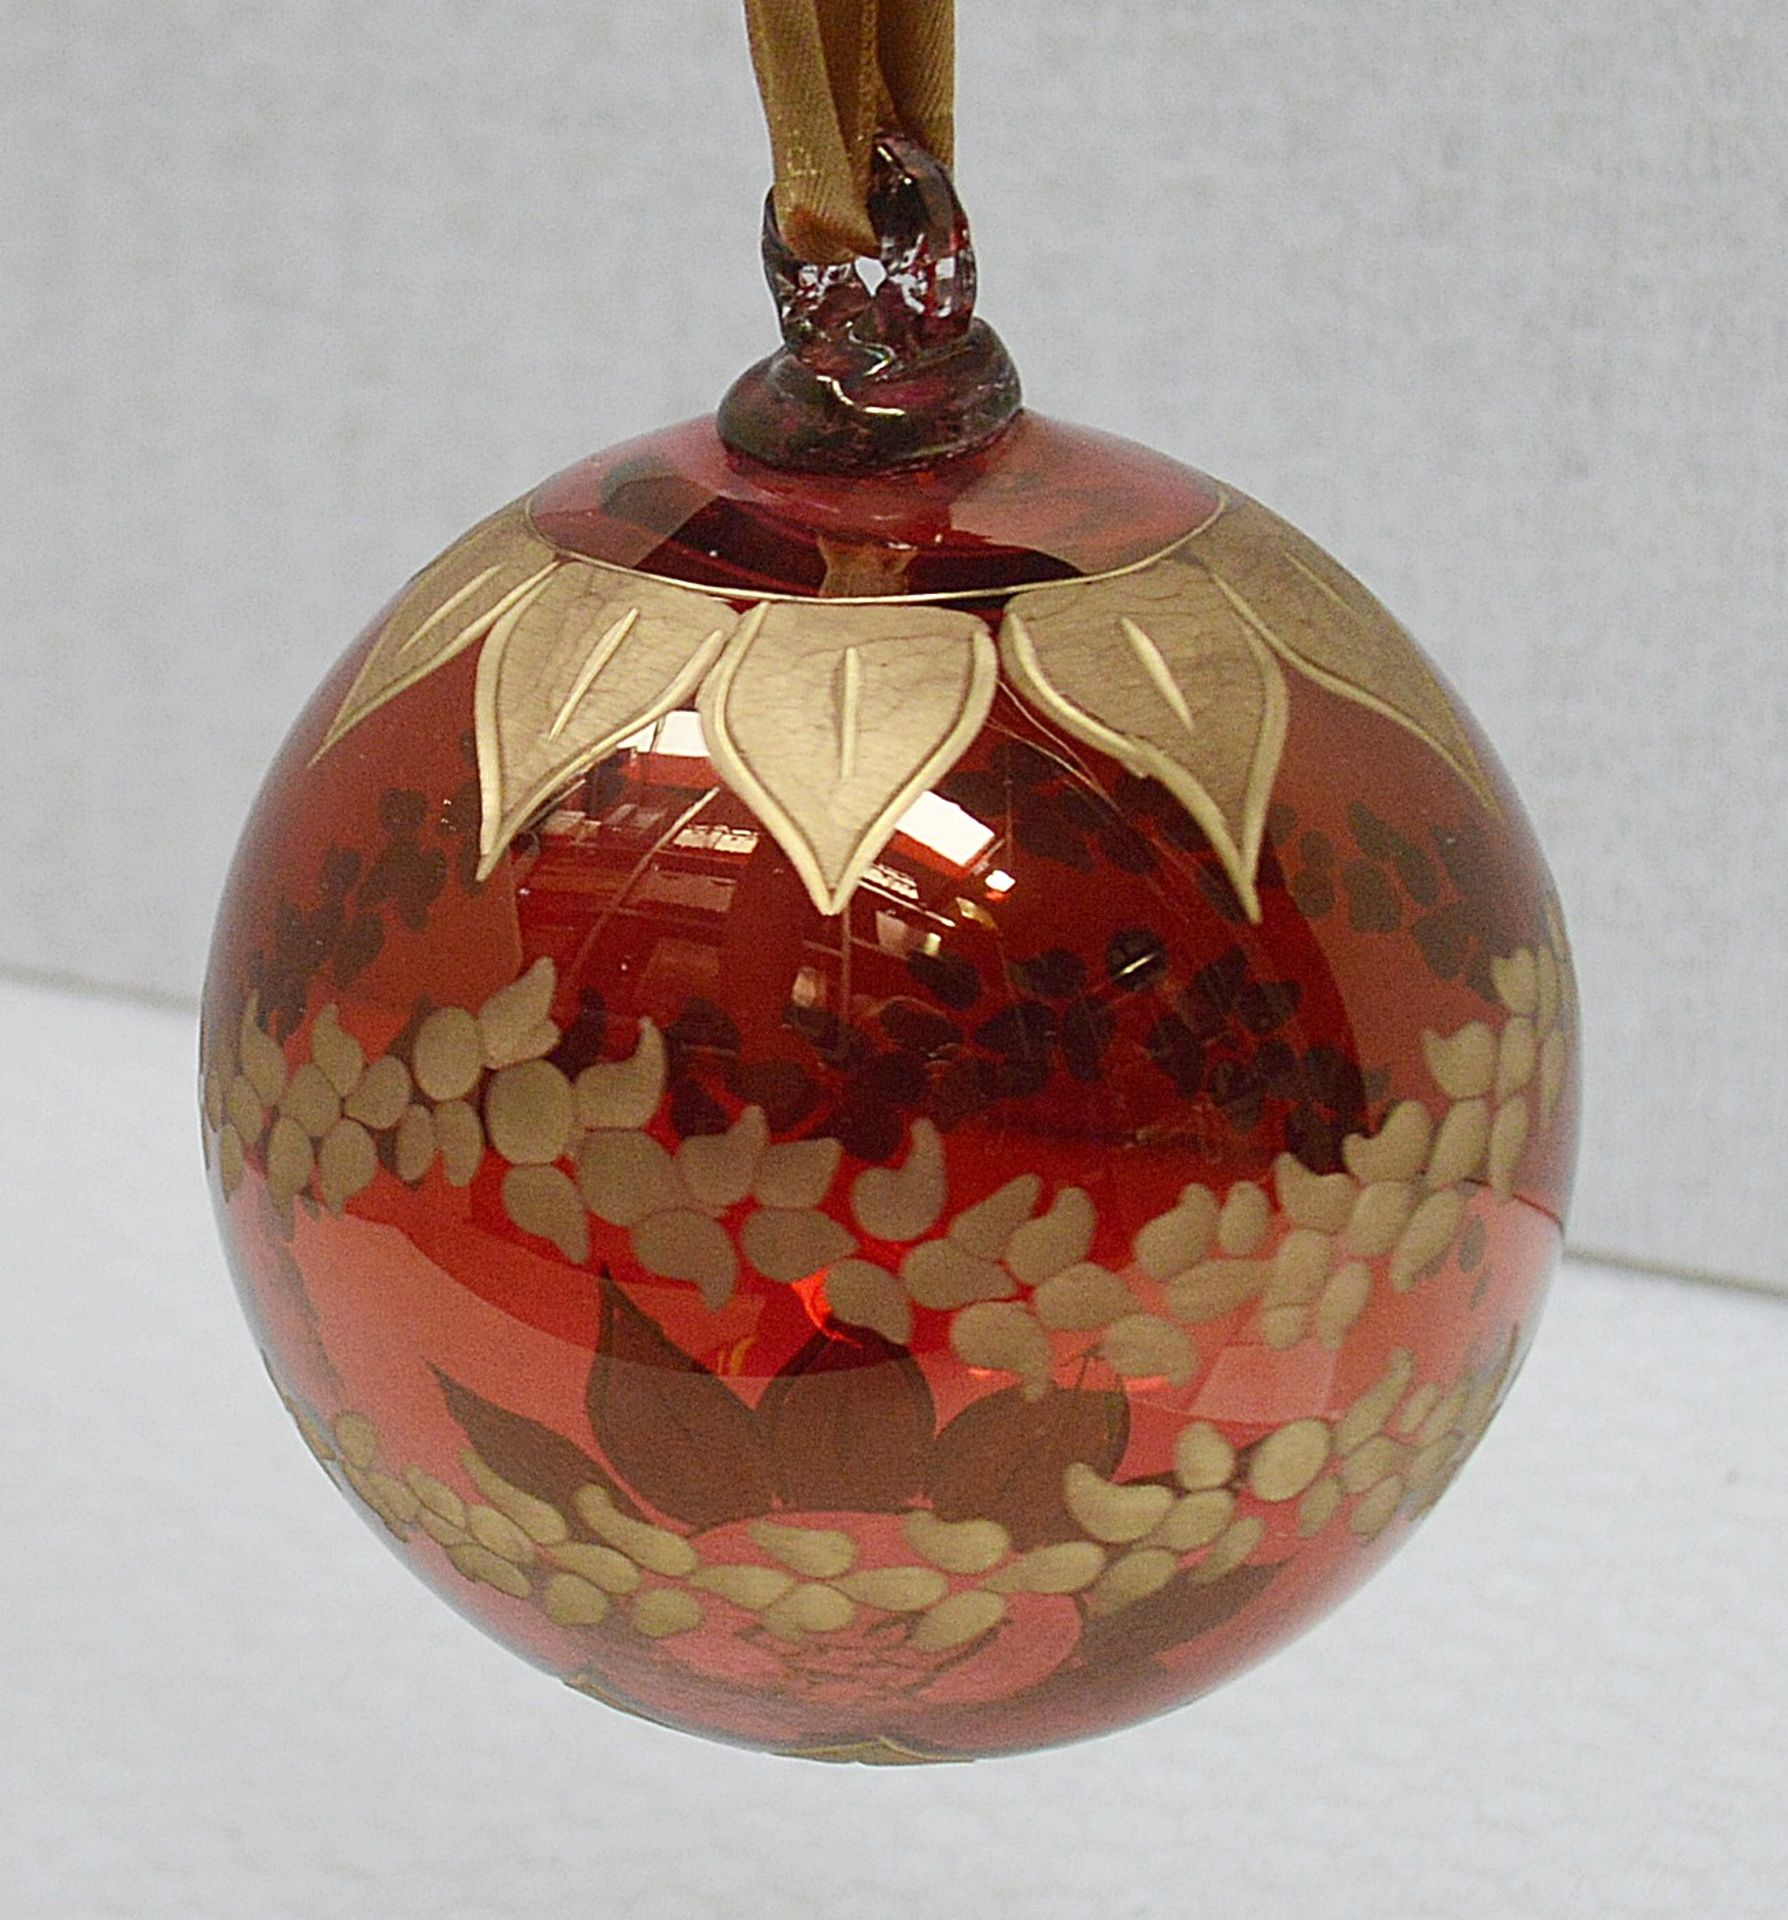 1 x BALDI 'Home Jewels' Italian Hand-crafted Artisan Christmas Tree Decoration Original RRP £114.00